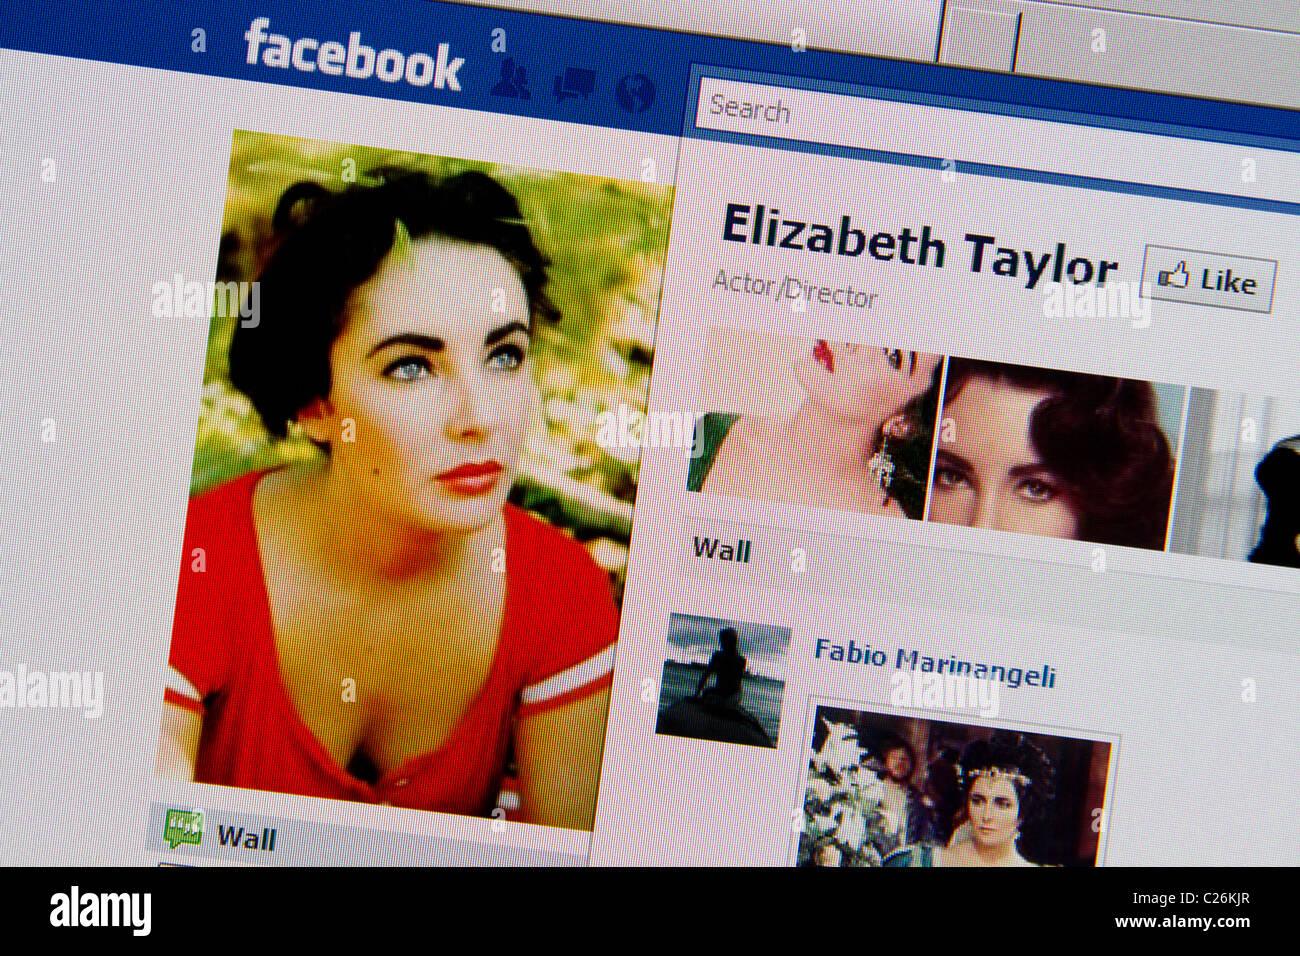 Elizabeth Liz Taylor facebook online fanclub - Stock Image